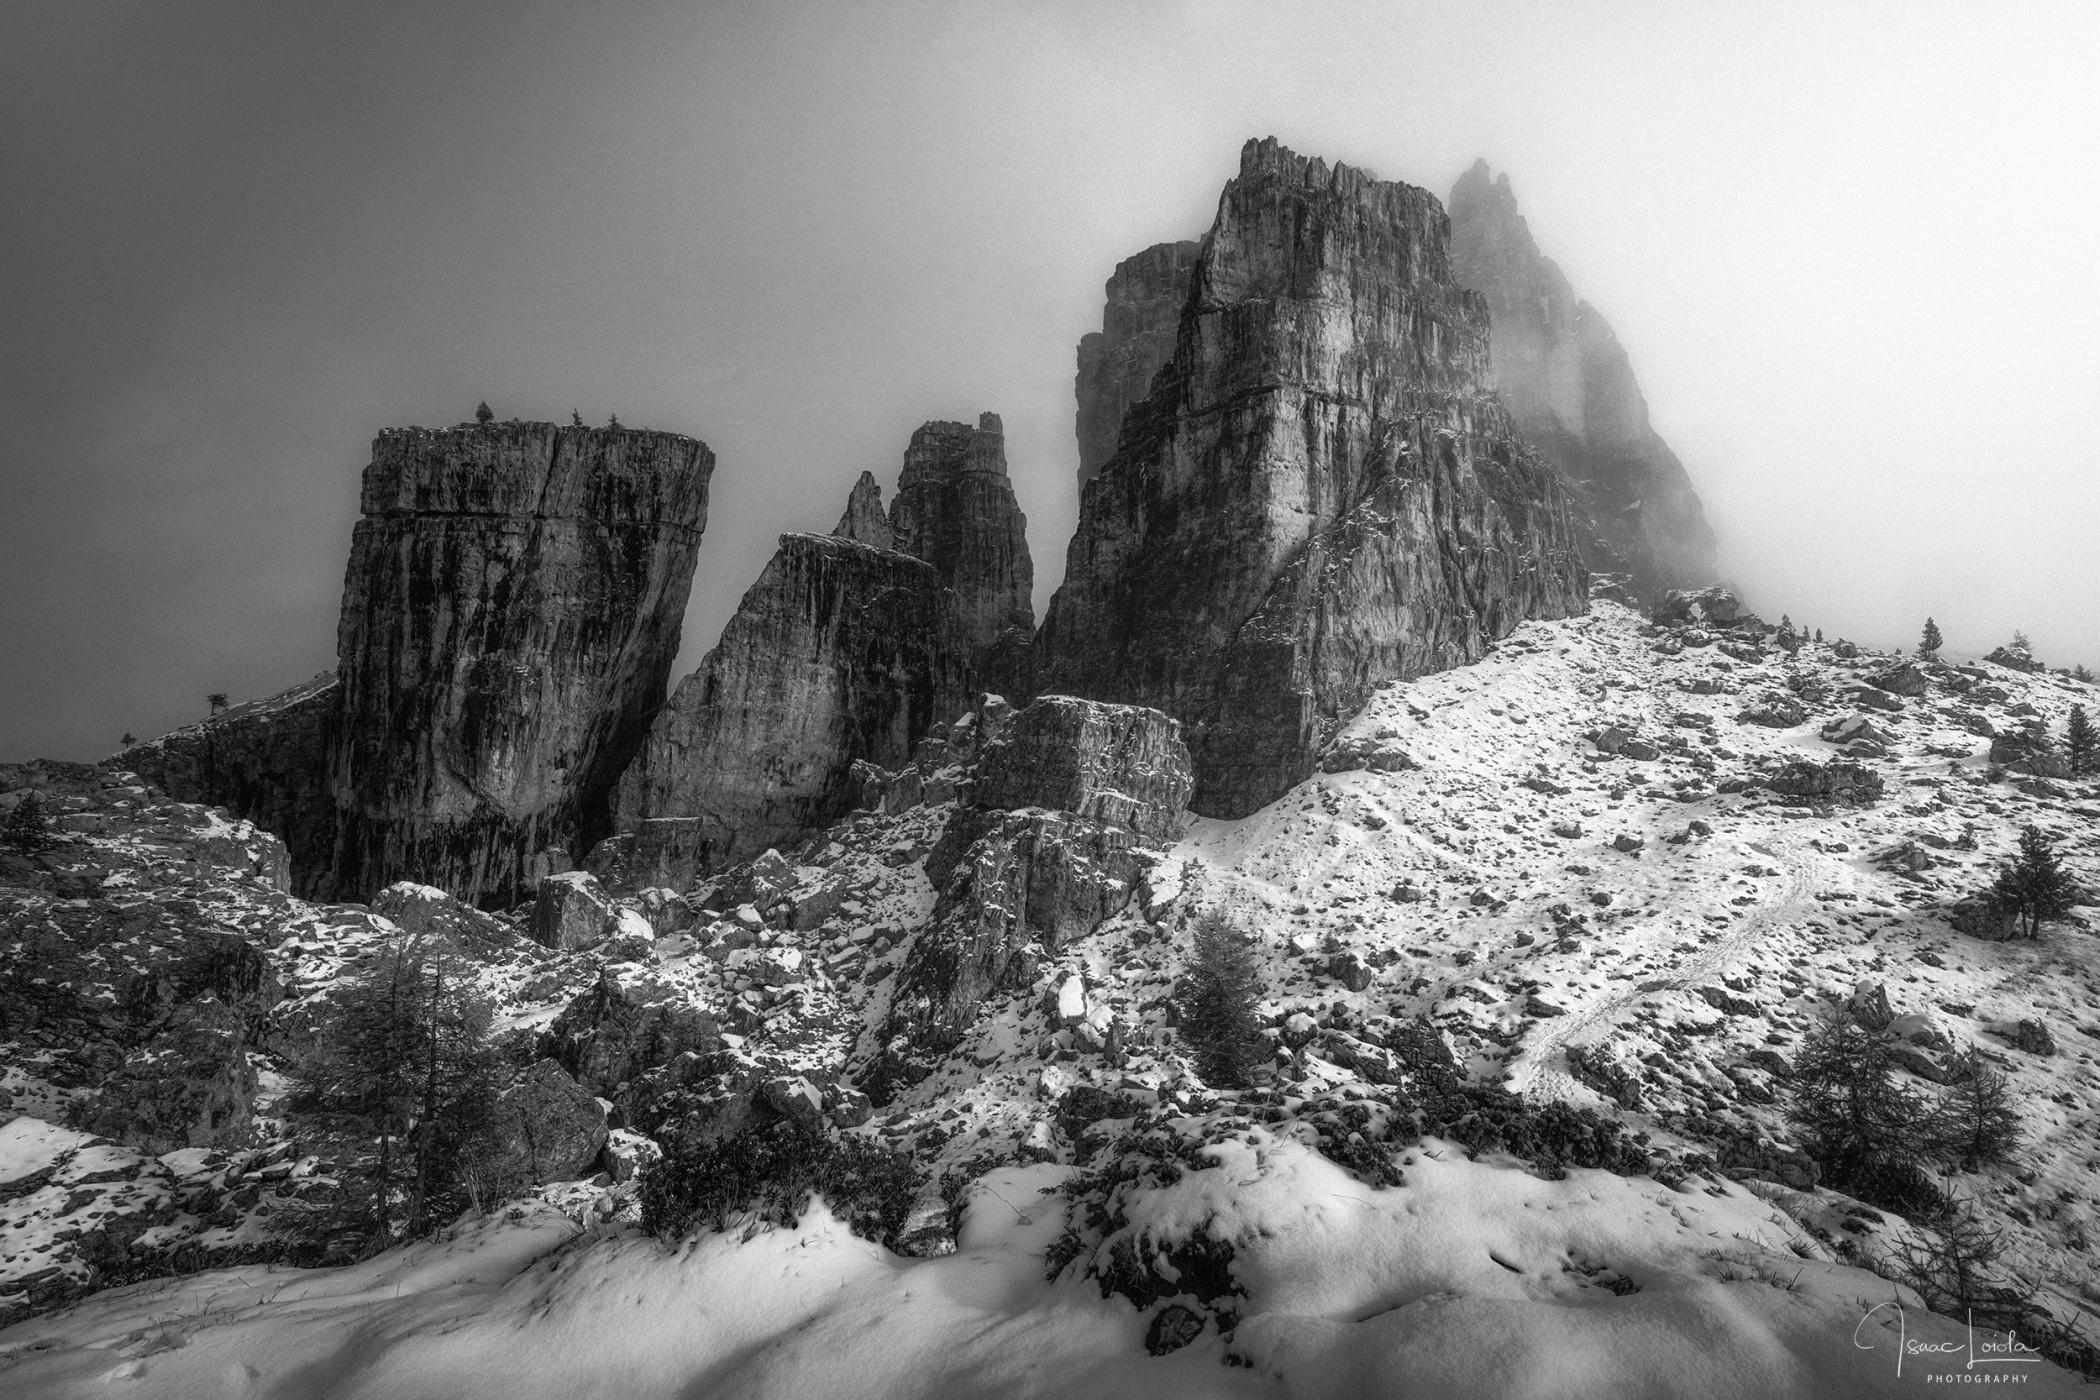 Cinque Torri - Monochromo - Isaac Loiola, Photography